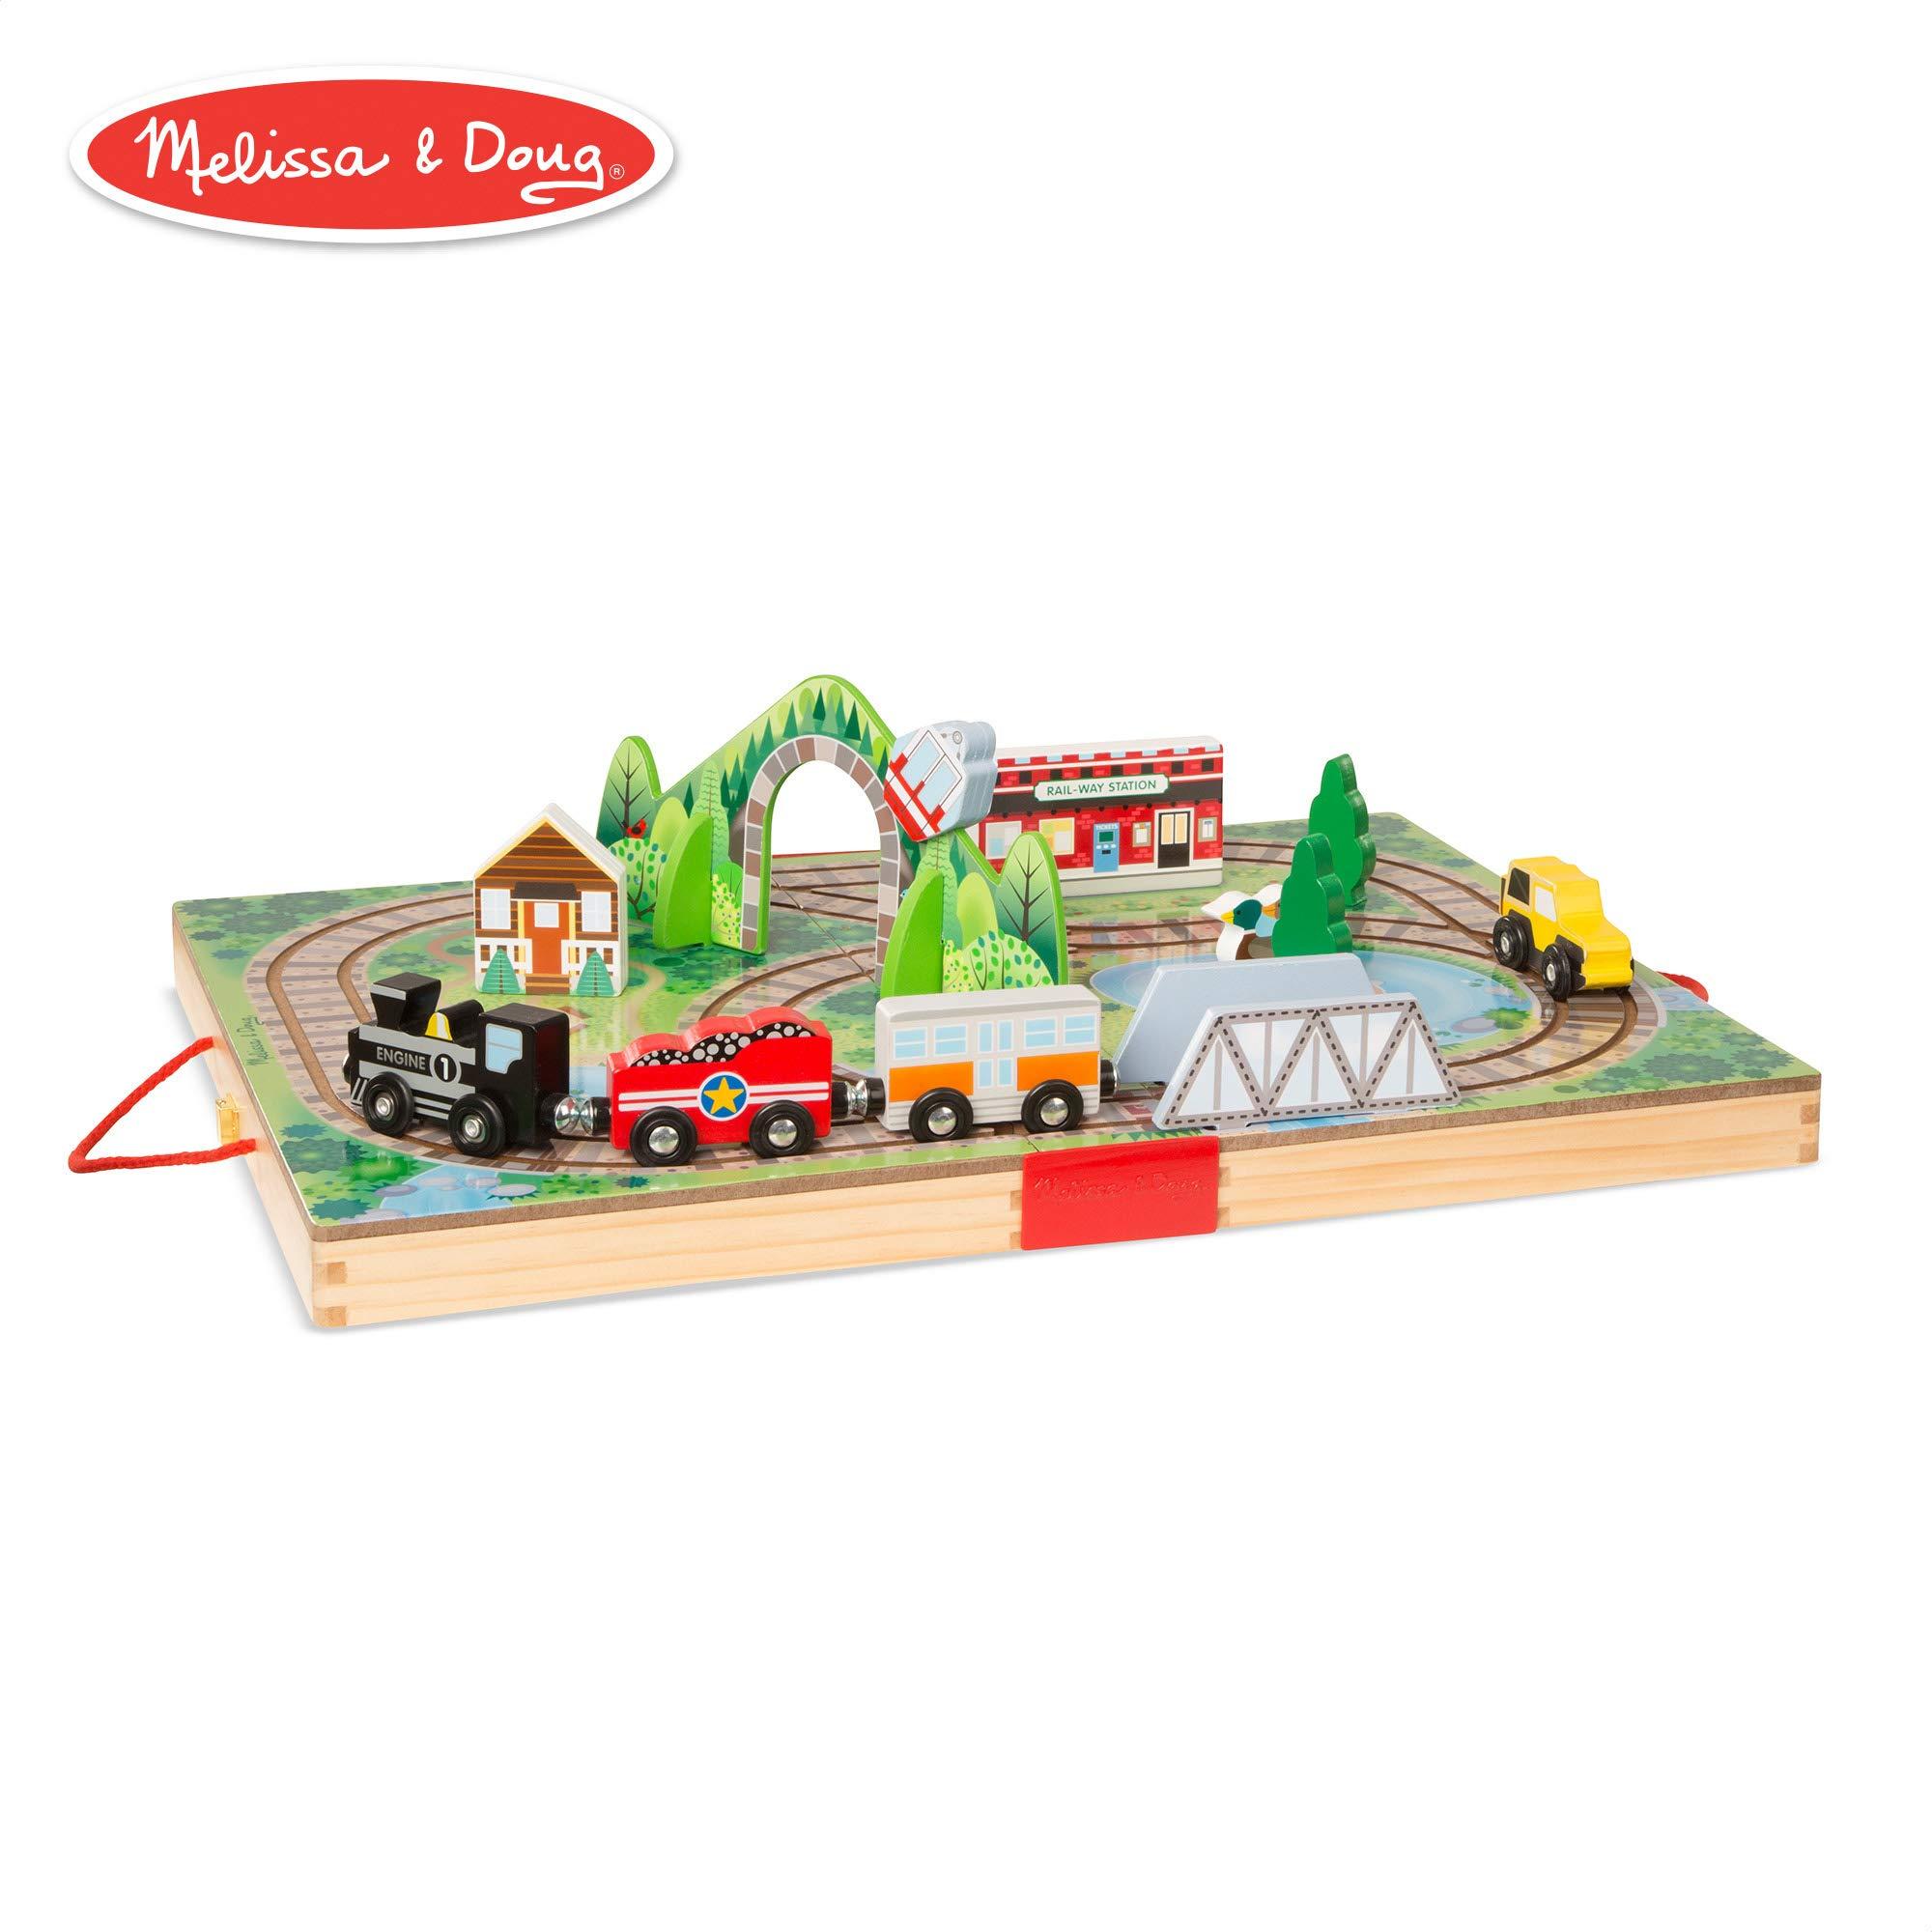 Melissa & Doug Take-Along Railroad (Portable Tabletop Set, 3 Train Cars, 17 Pieces) by Melissa & Doug